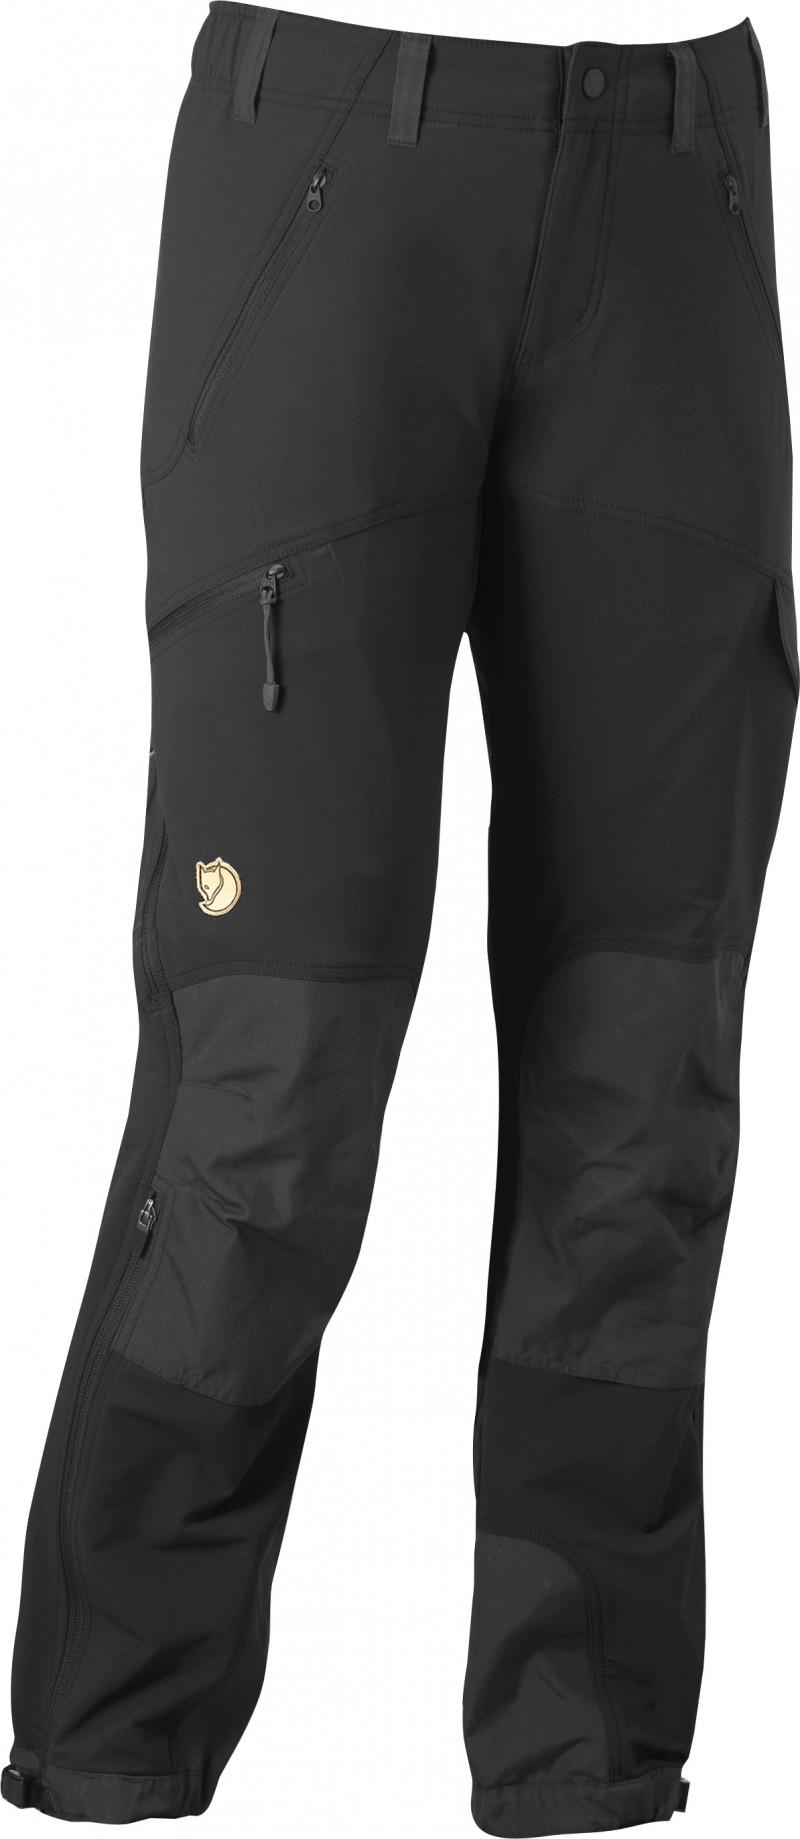 FjallRaven Älv Trousers W. Black-Dk.Grey-30